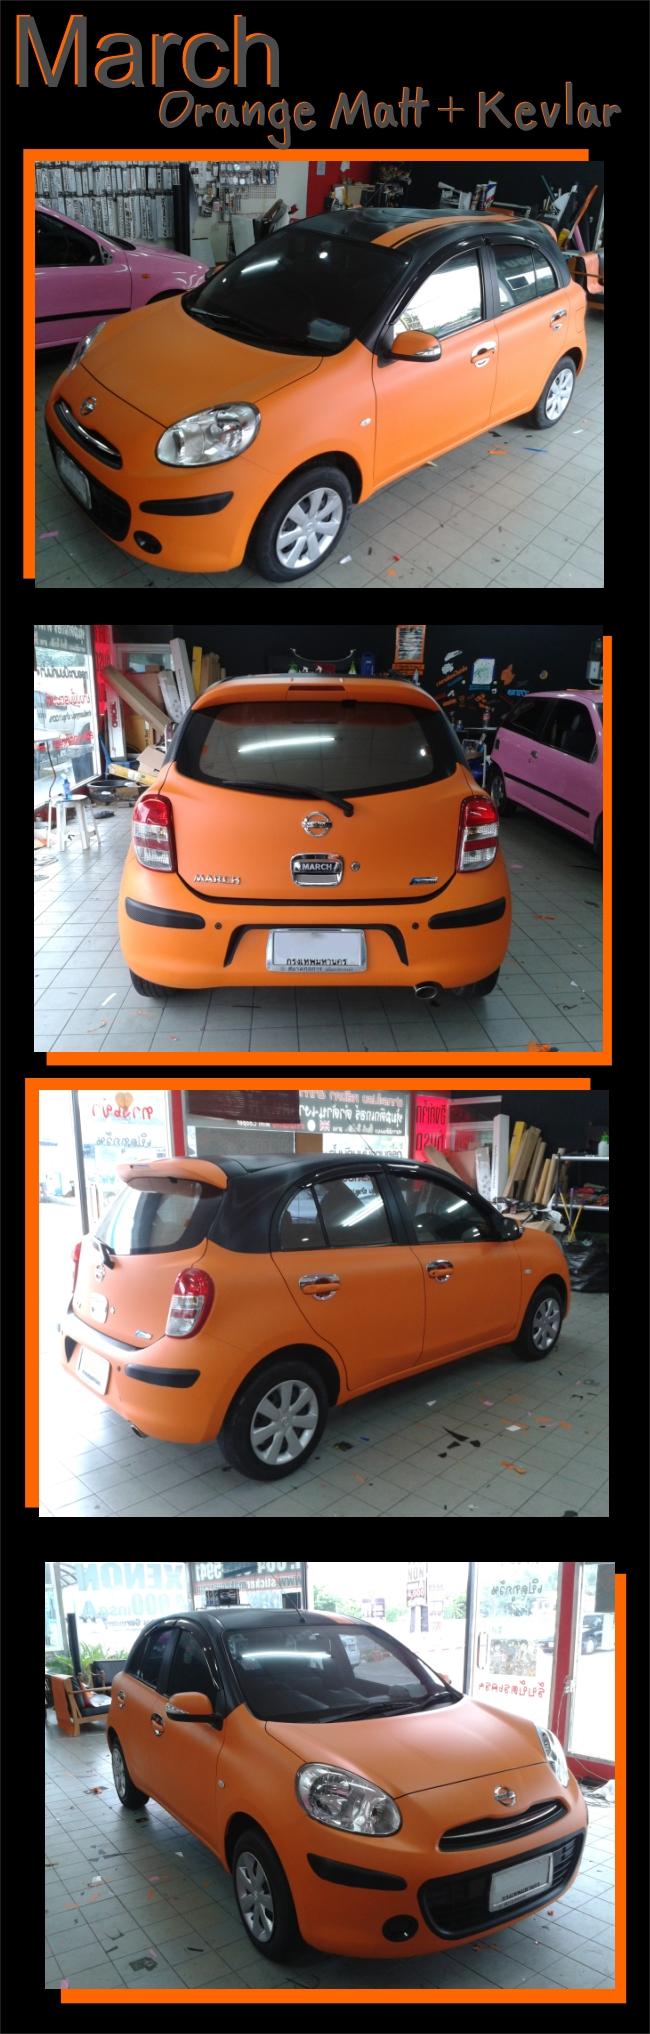 wrap car nissan march orange matt ฟิล์มหุ้มเปลี่ยนสีรถ เปลี่ยนสีรถทั้งคันด้วยสติกเกอร์ wrapเปลี่ยนสีรถ เปลี่ยนสีรถดำด้าน